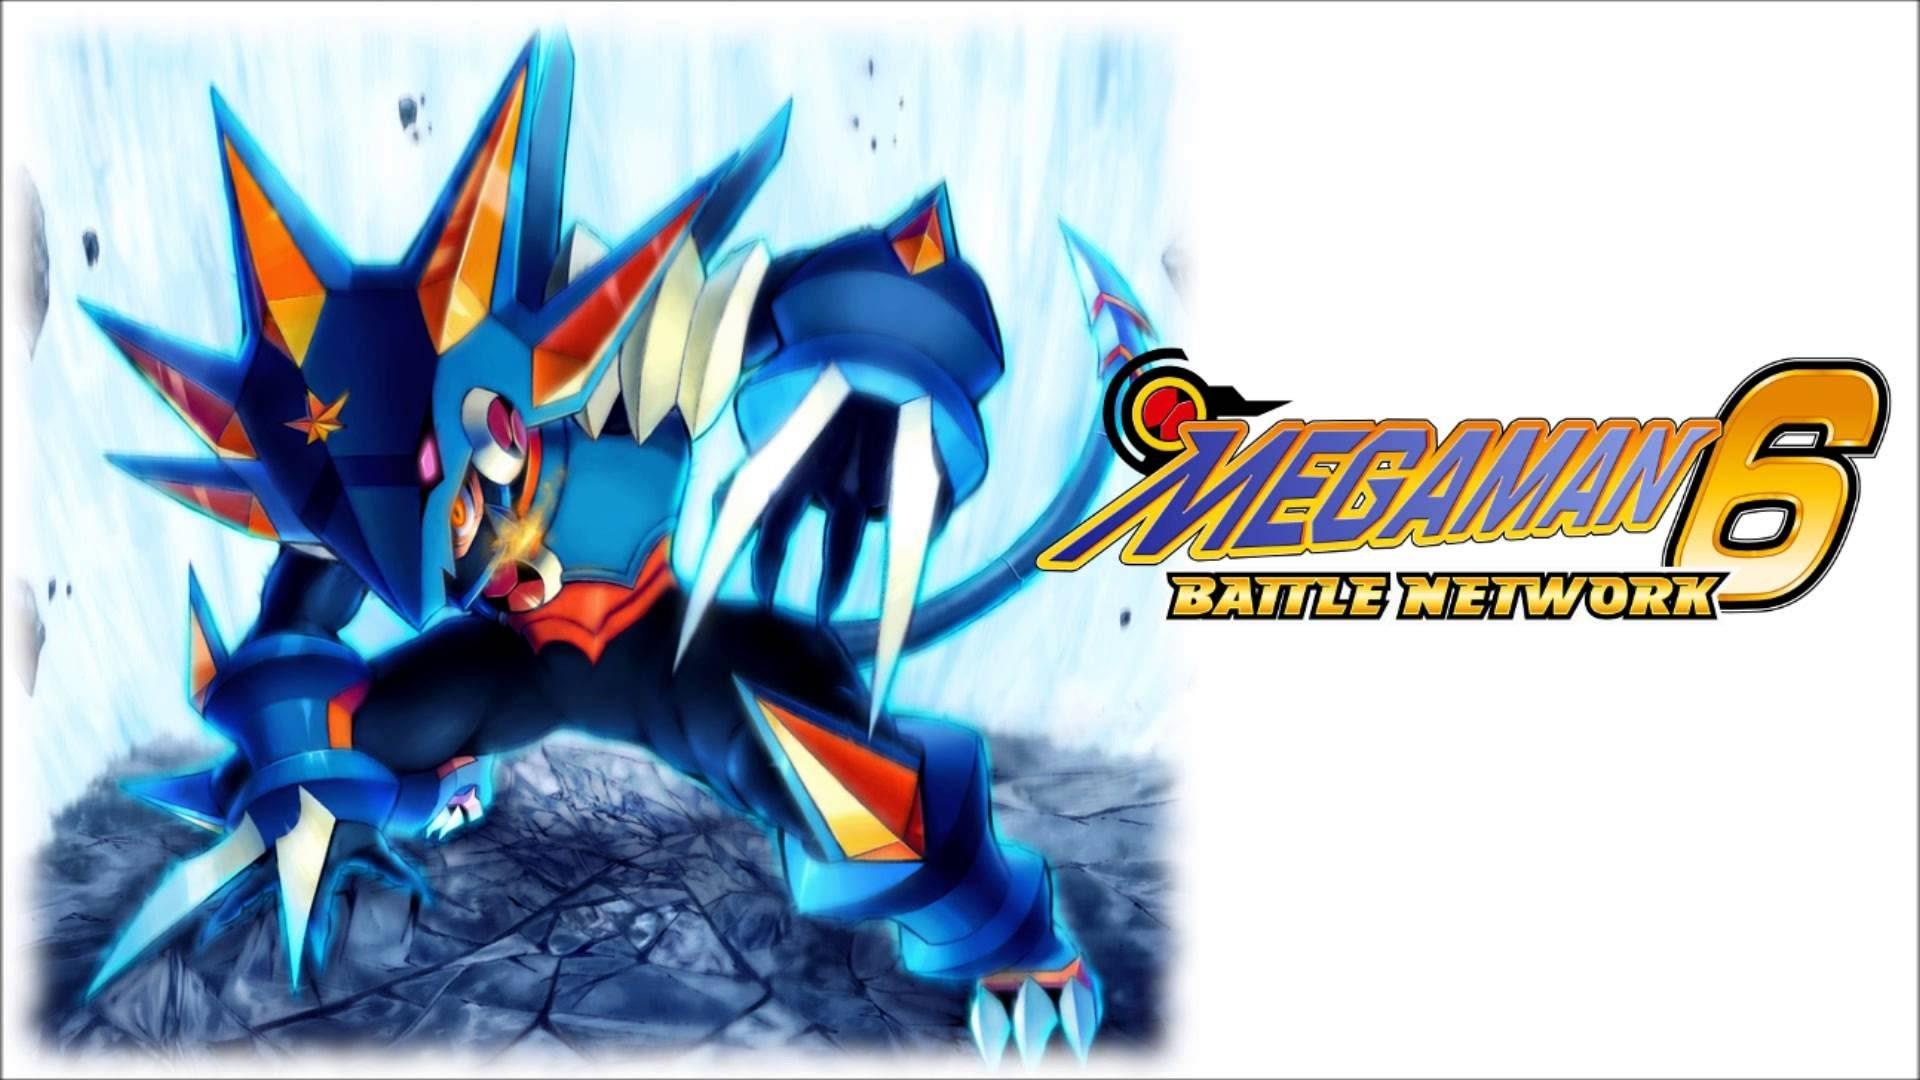 Megaman Battle Network 6 Cybeast Remix Episode 1